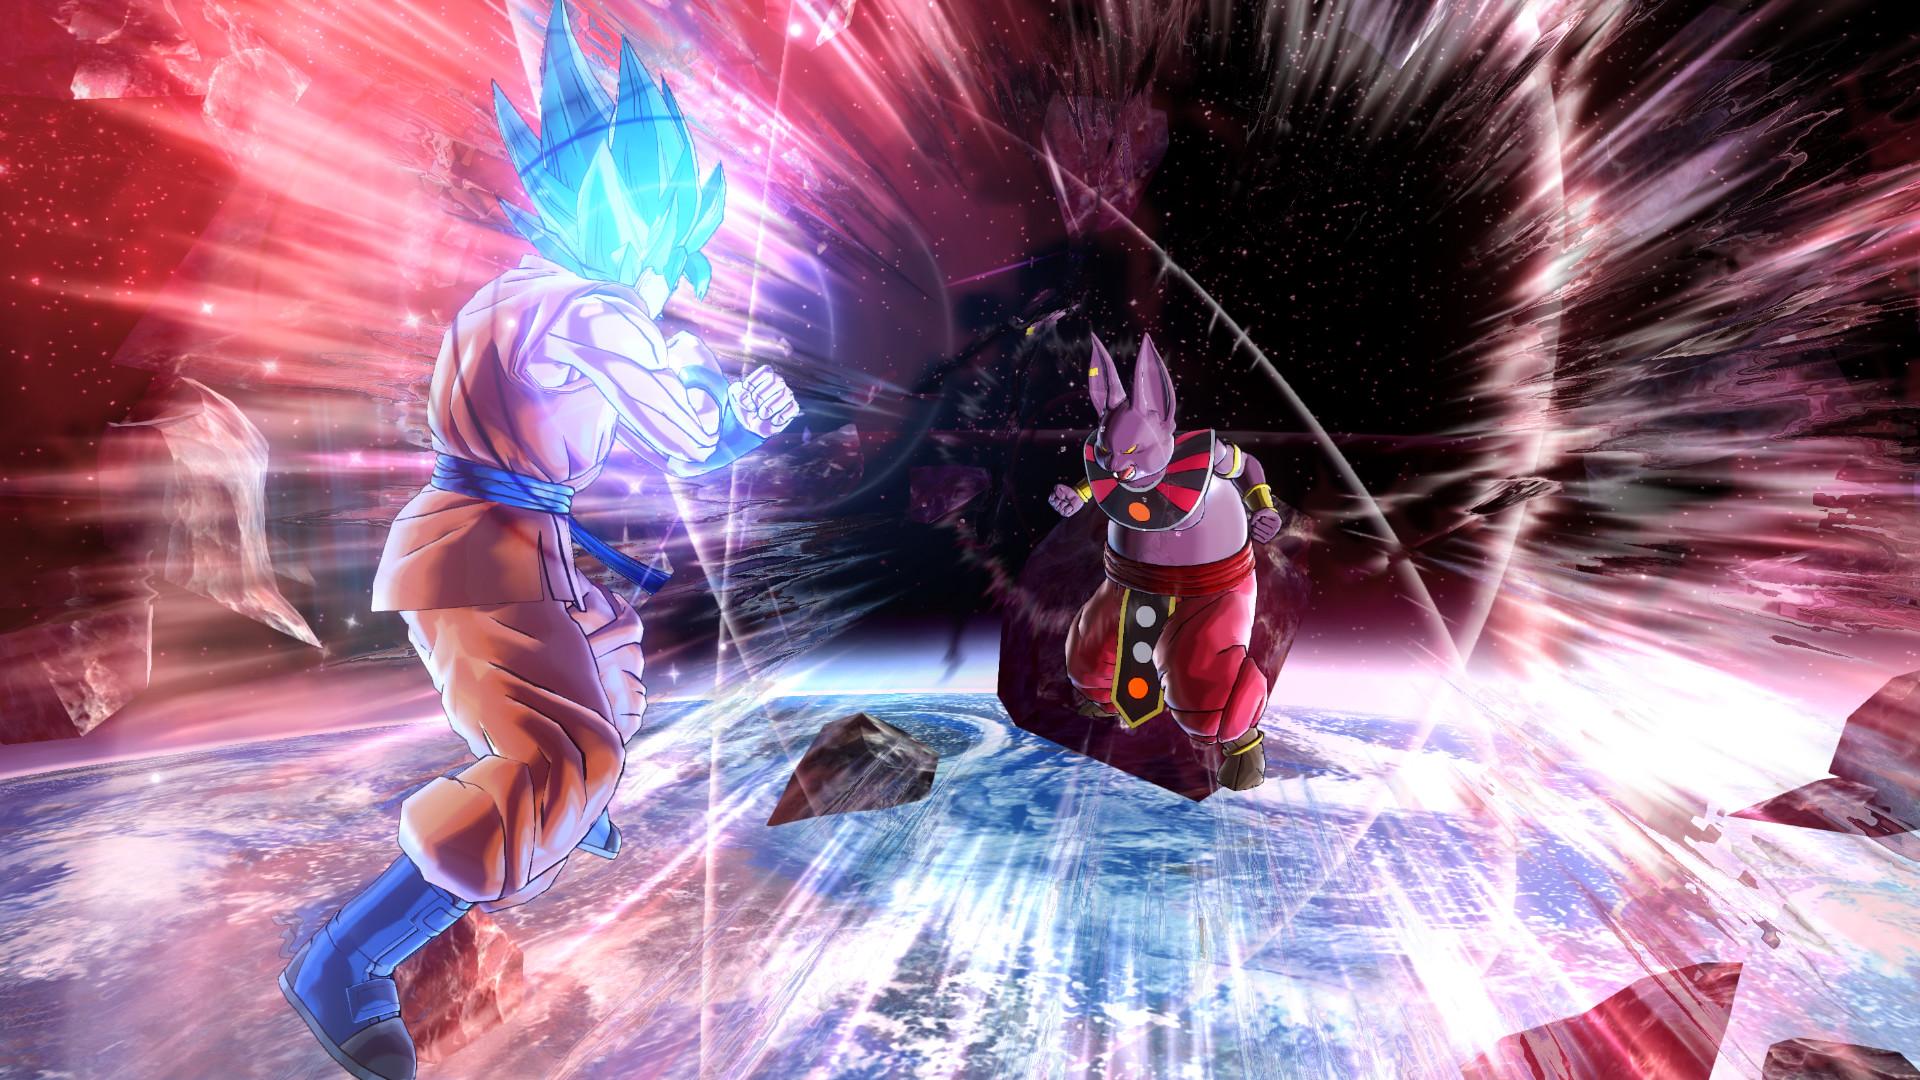 dragon-ball-xenoverse-2-pc-screenshot-4